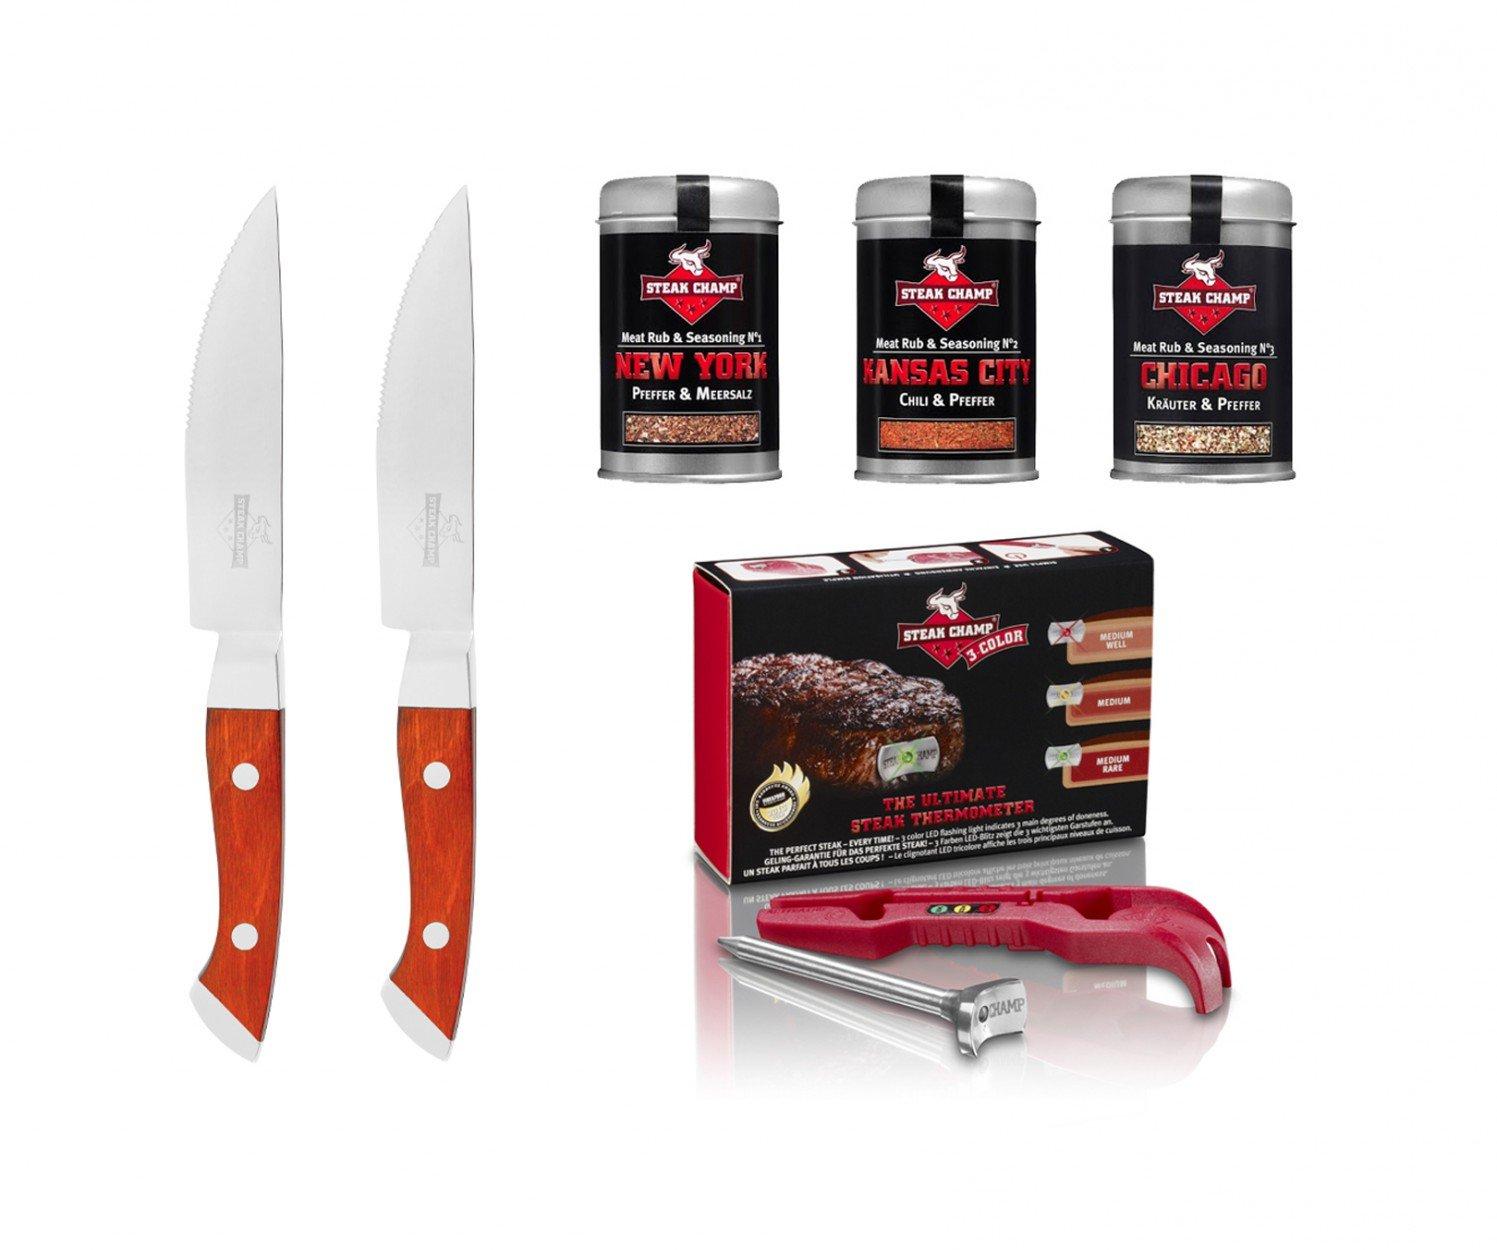 SteakChamp Gourmet Geschenk Set – 3-color günstig